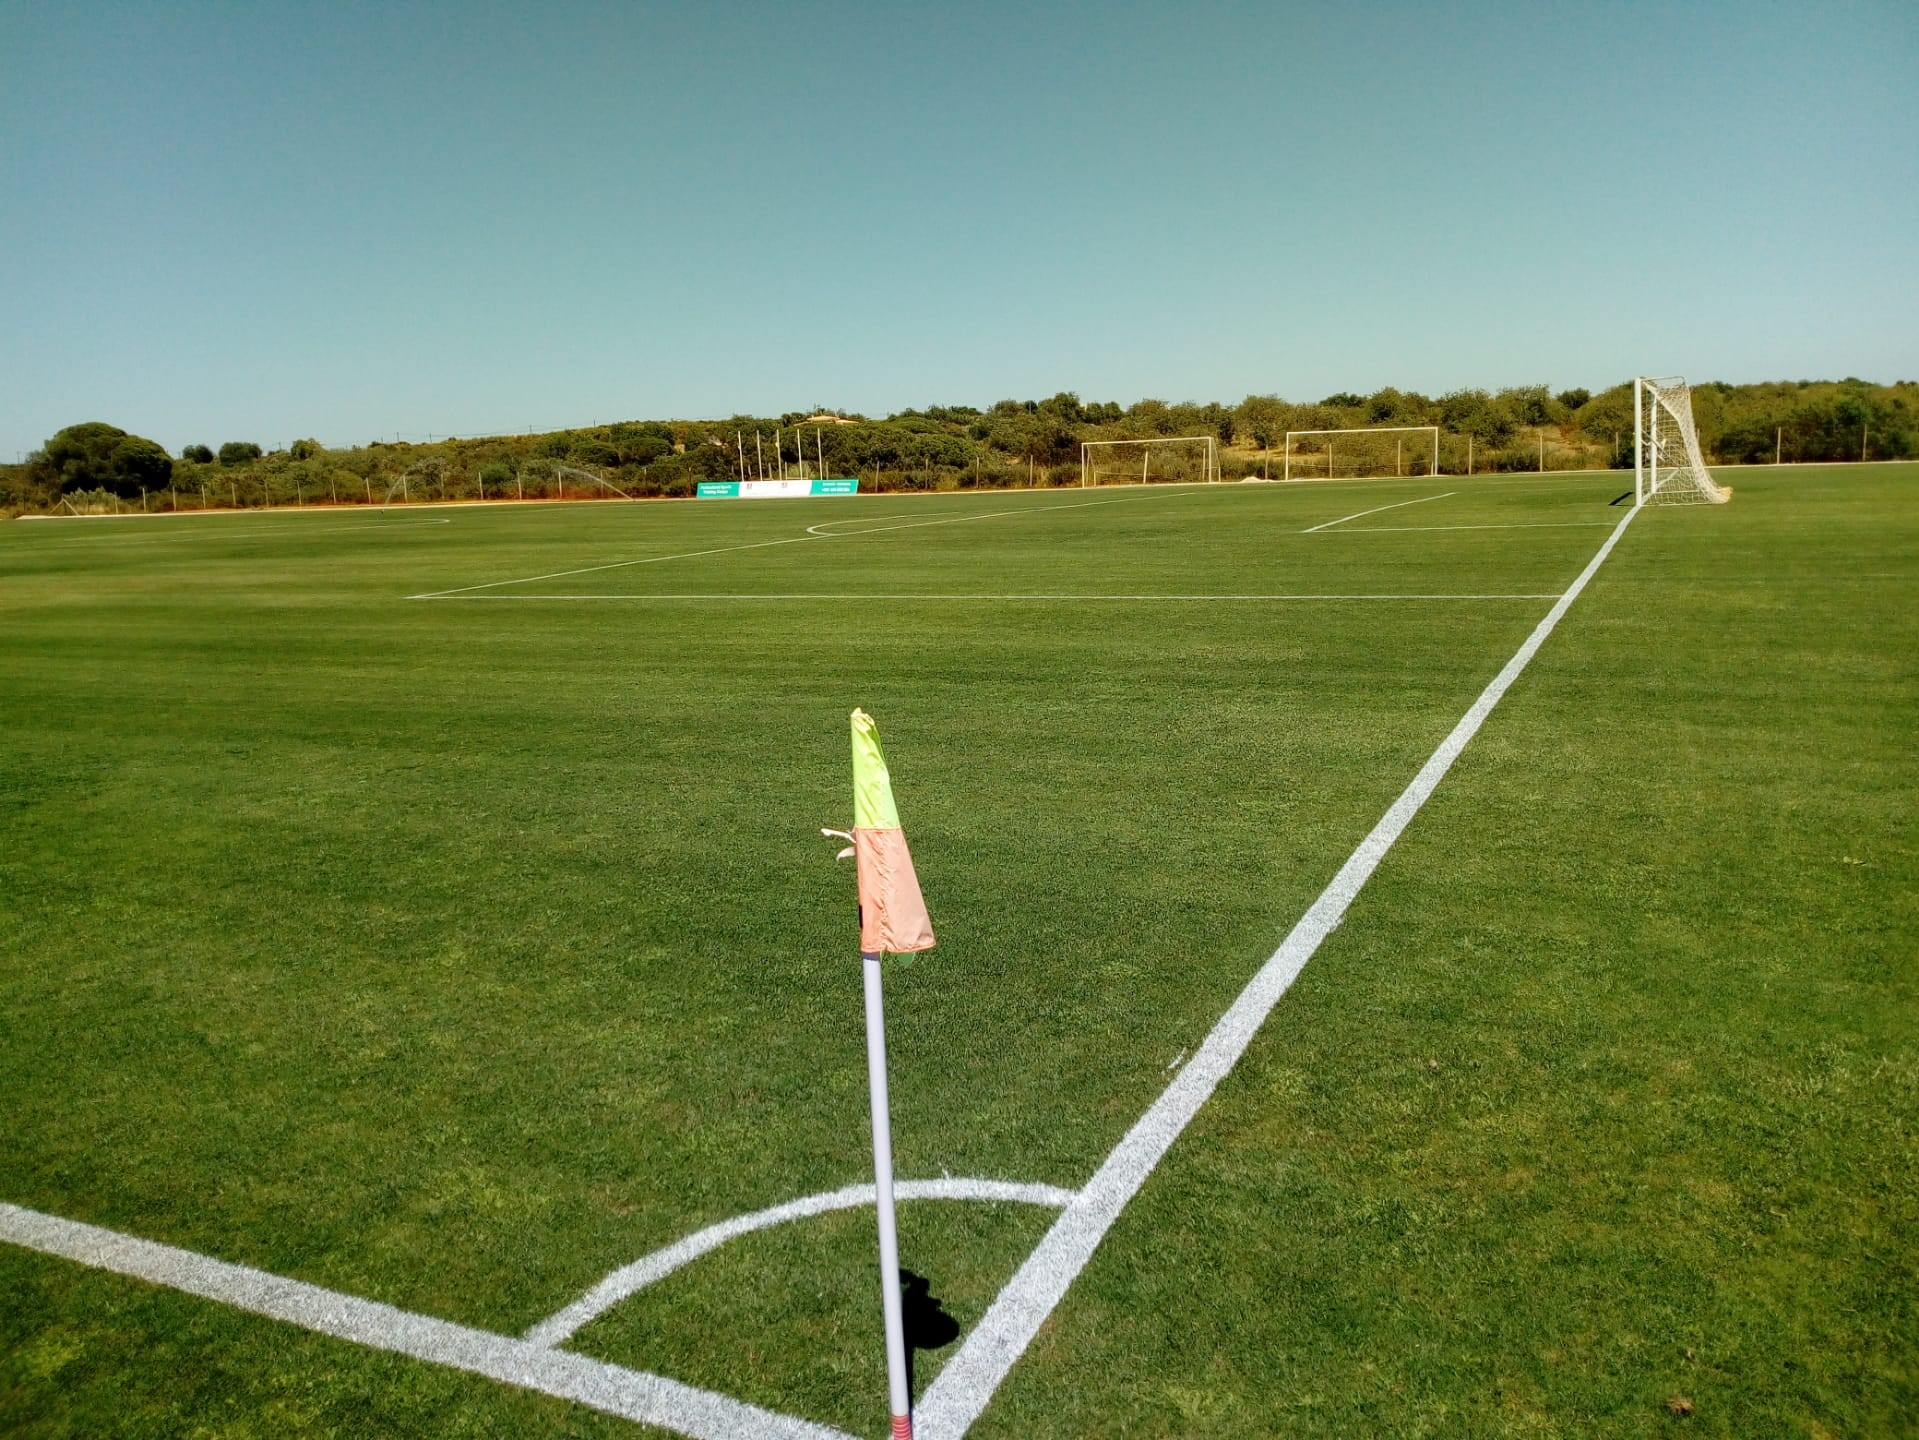 Football portugal colina verde 2